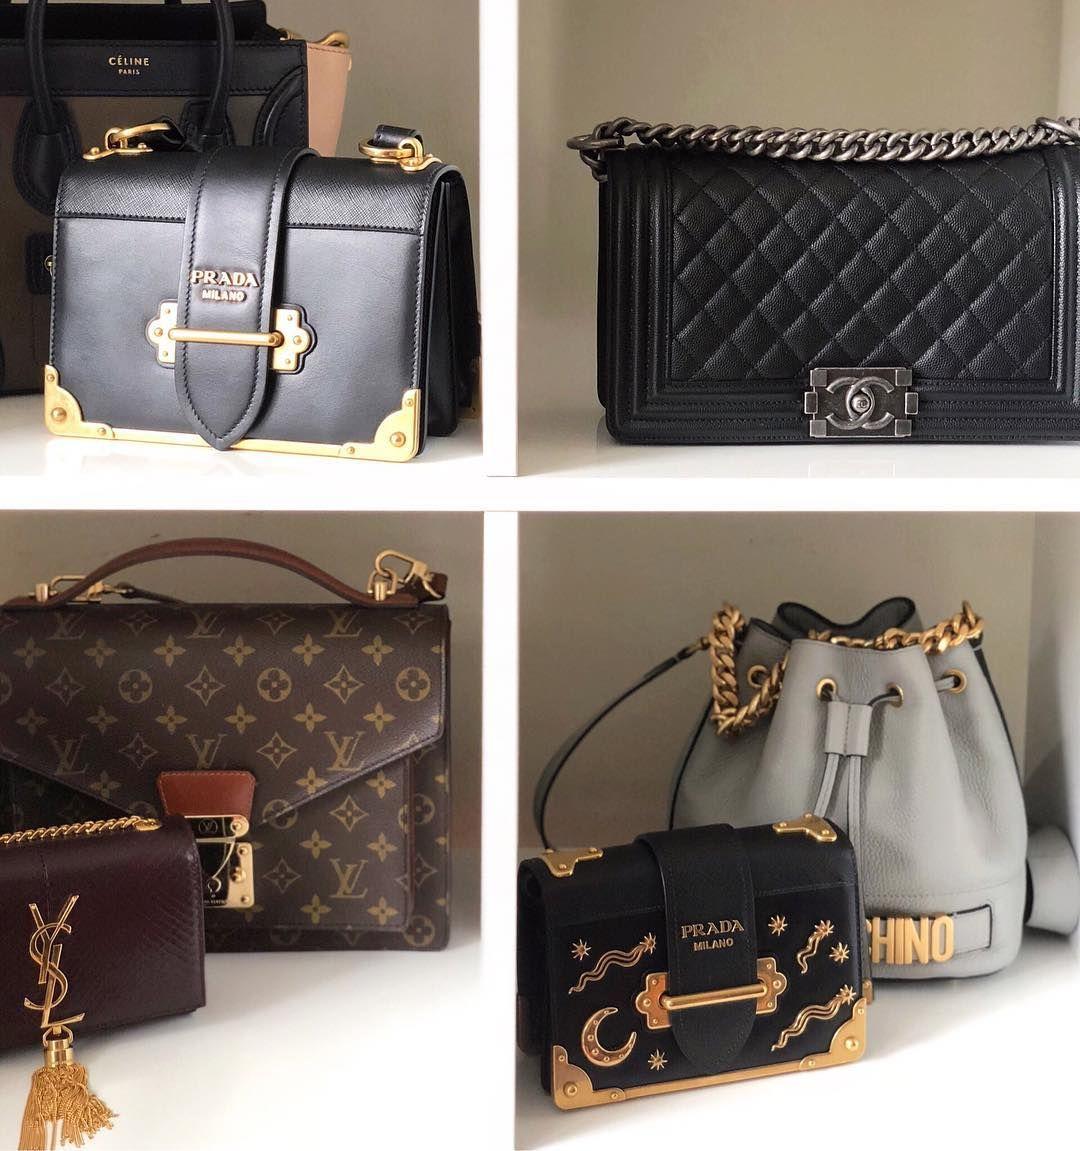 Designer handbag collection stored in IKEA Kallax  Louis Vuitton vintage  monogram Monceau bag 54e5f418931ca